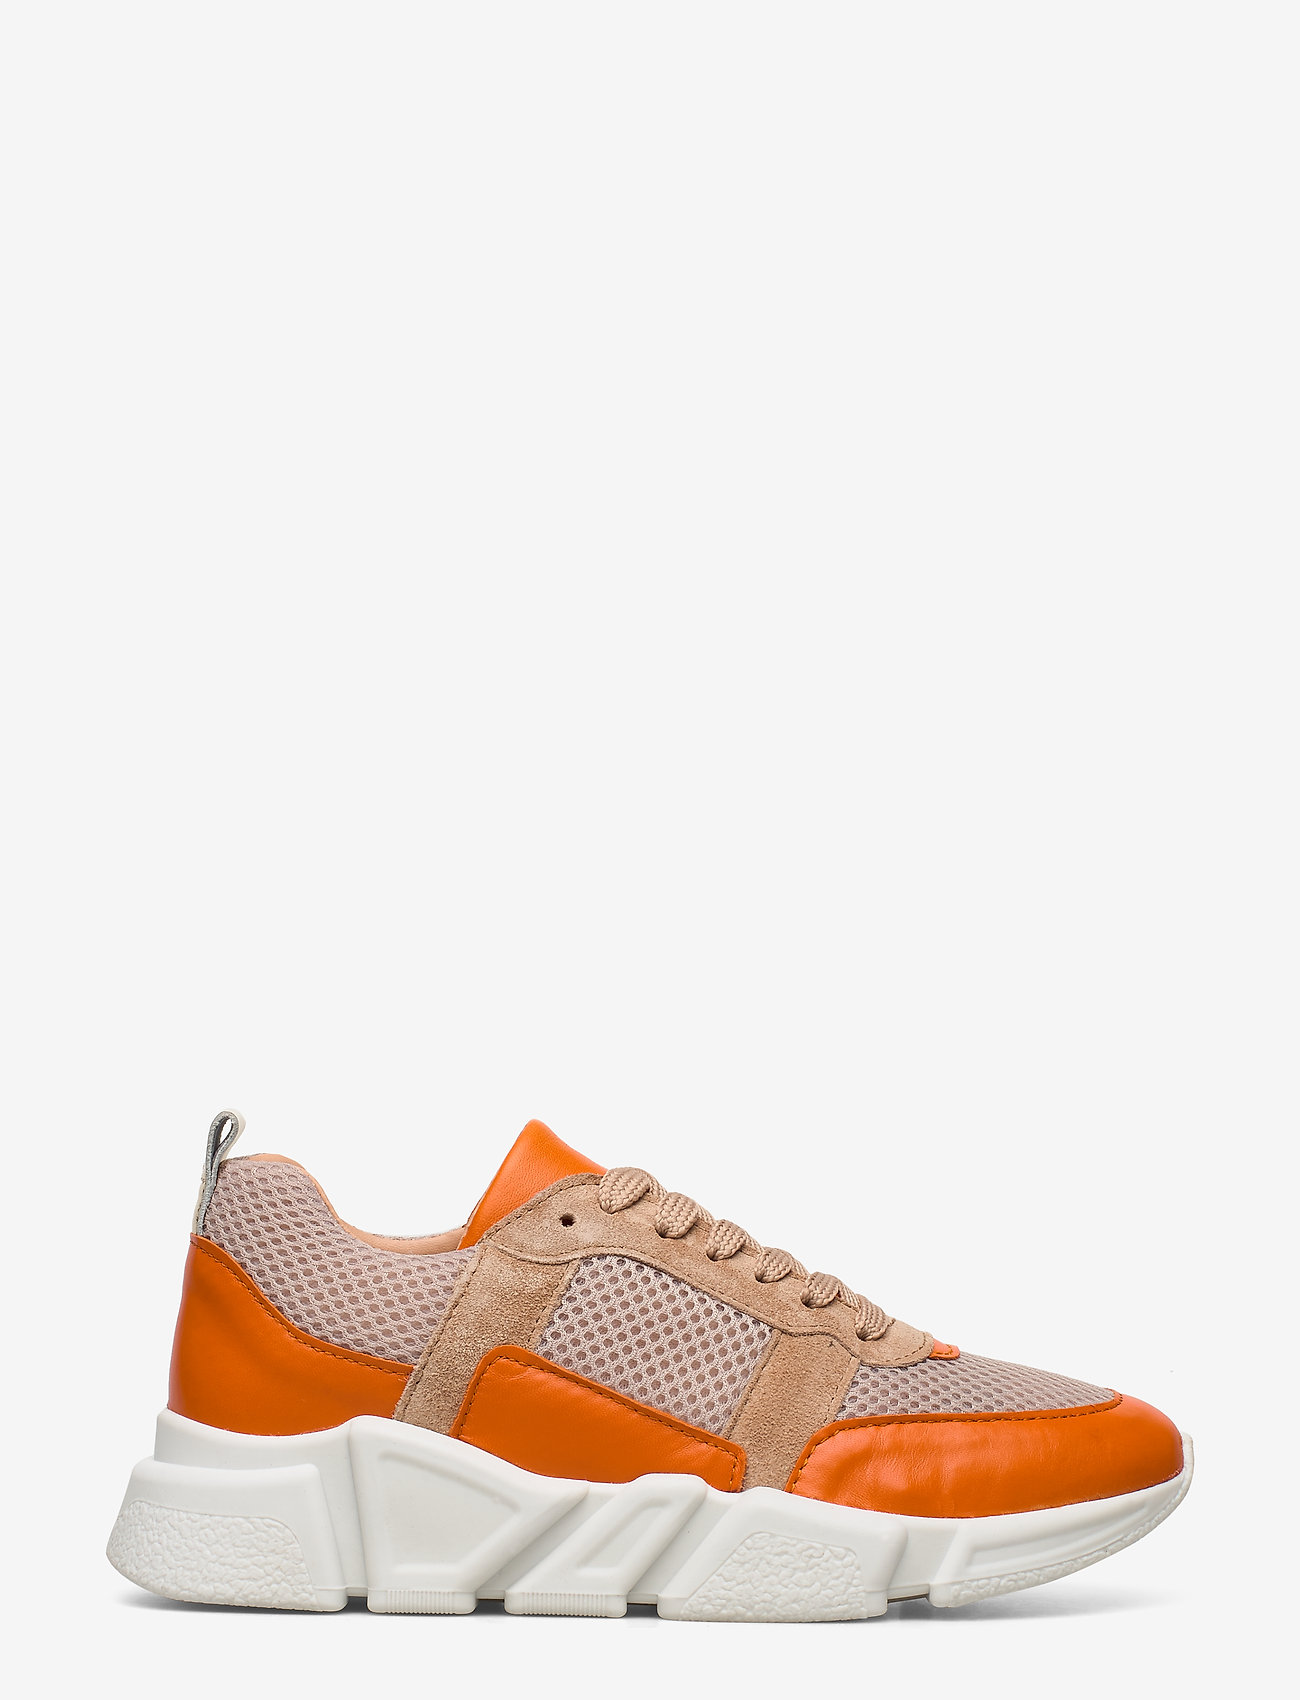 Billi Bi - SHOES 8853 - chunky sneakers - orange/beige comb. - 1